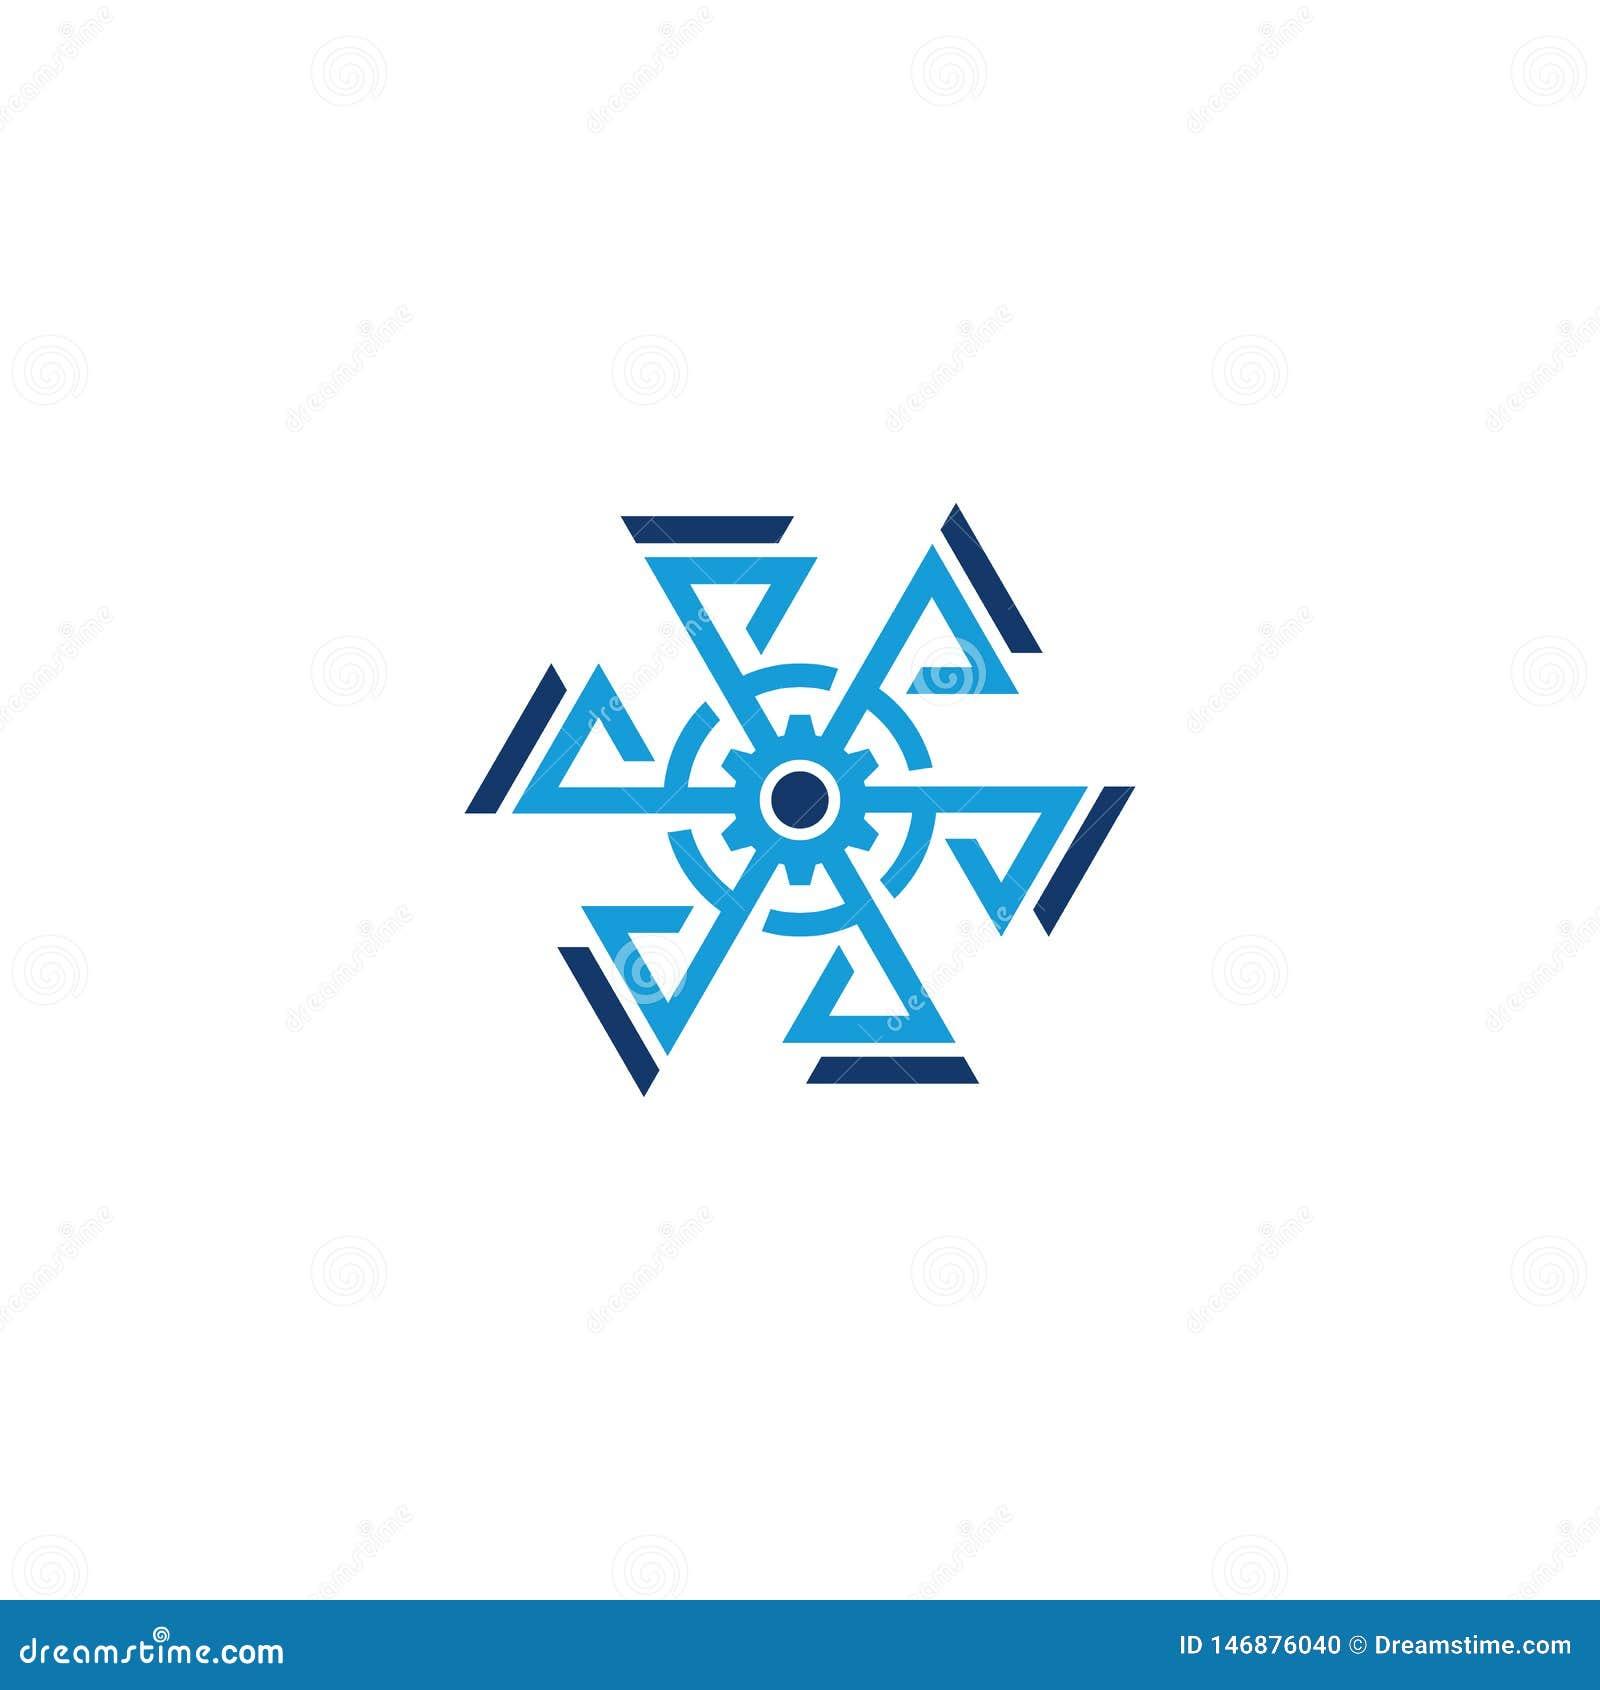 Hexagon gear arrow business logo